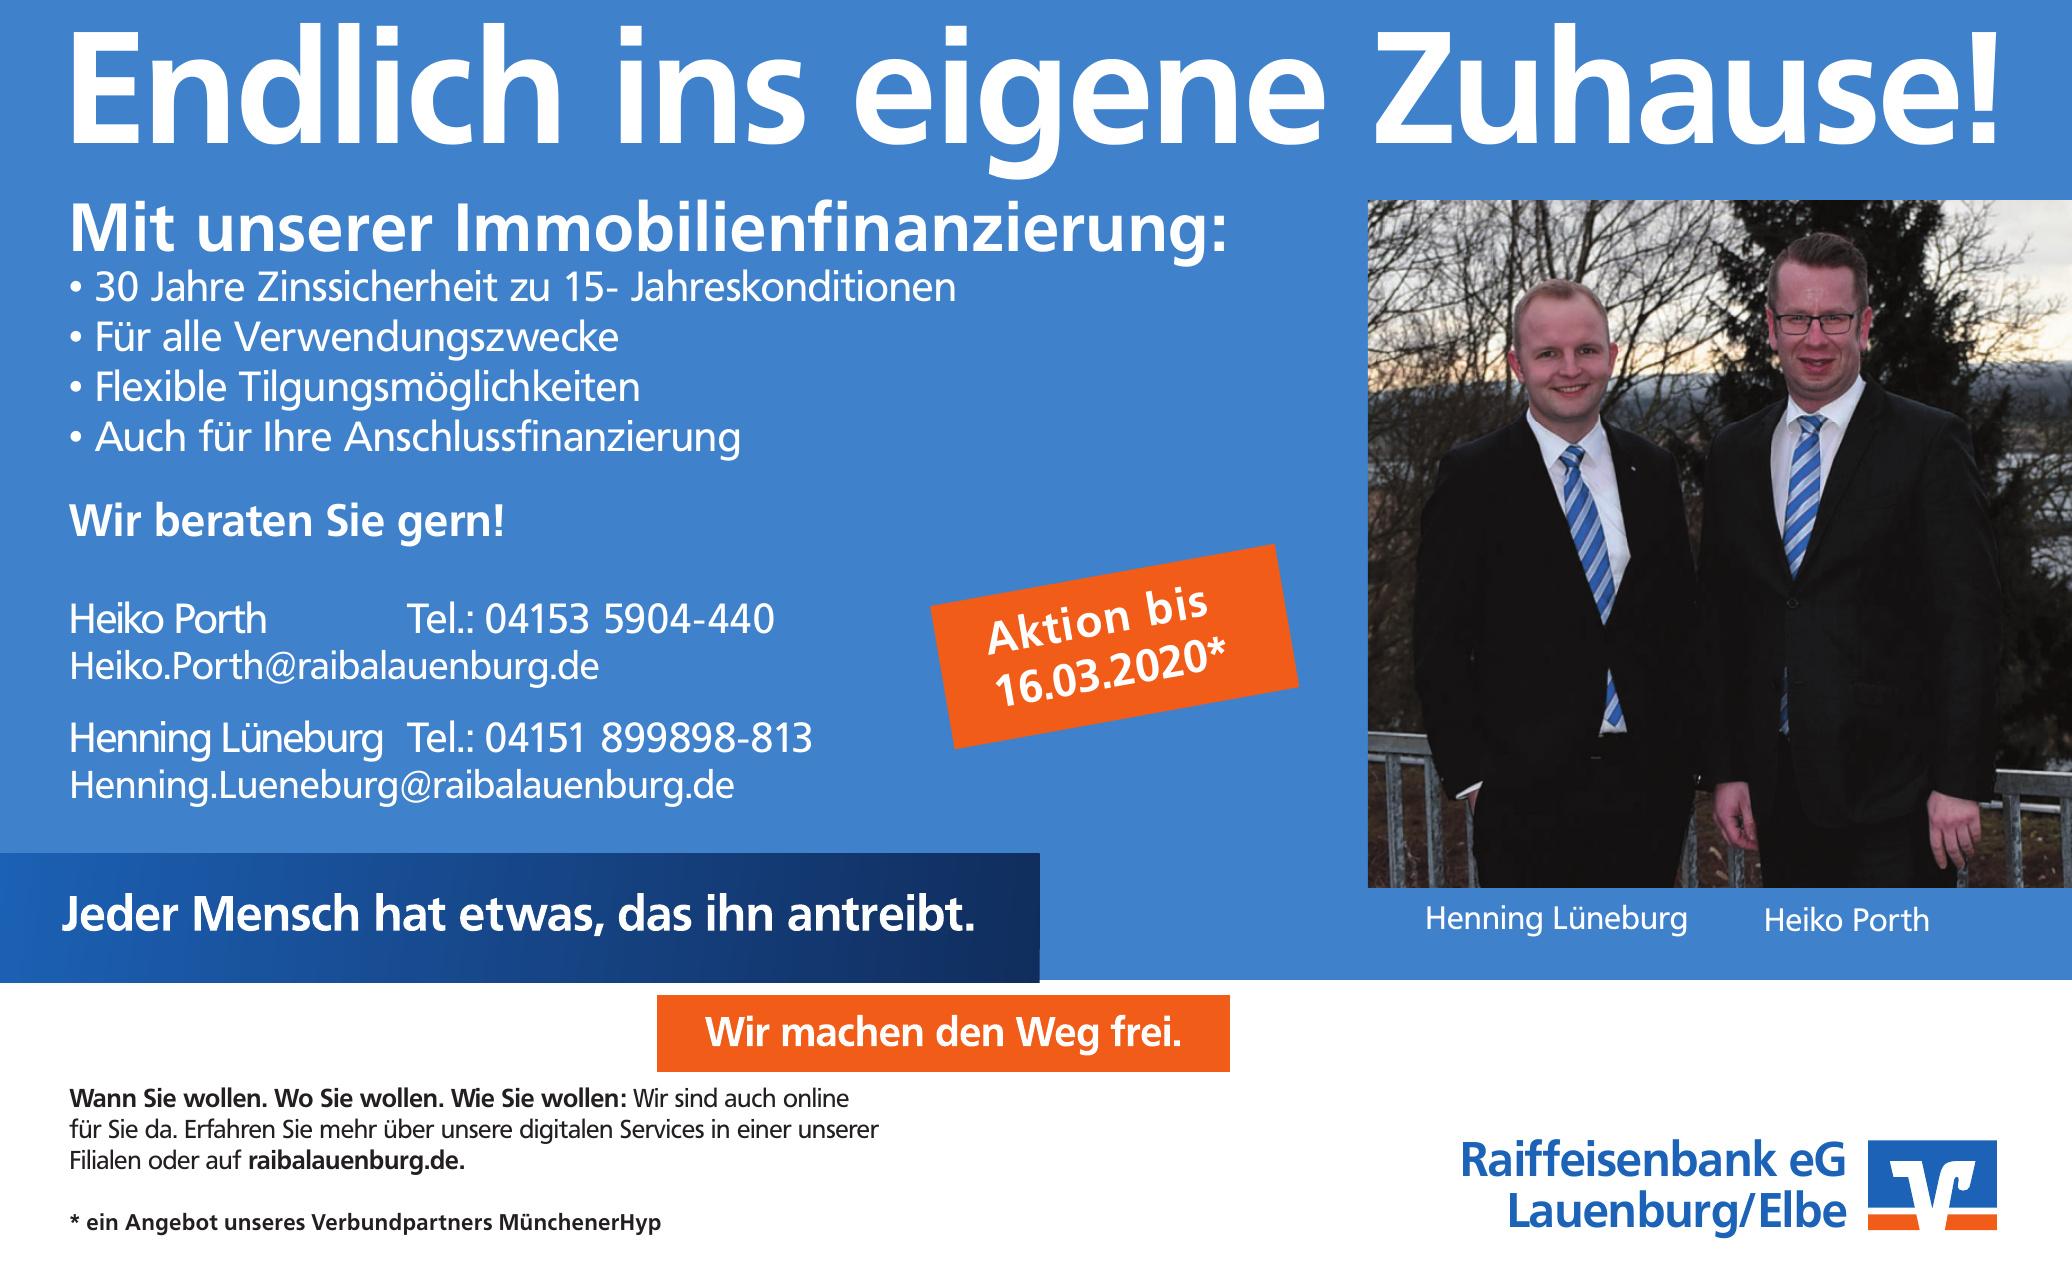 Raiffeisenbank eG Lauenburg/Elbe